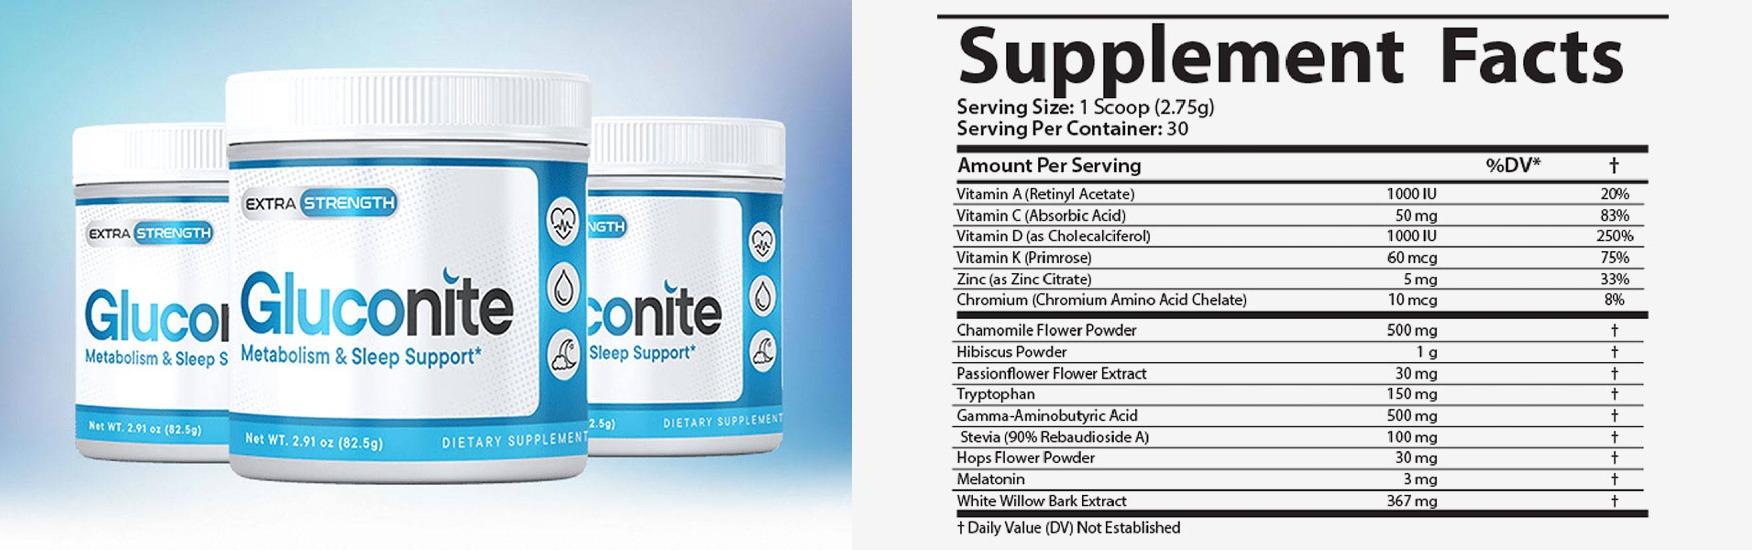 Gluconite Ingredients Label